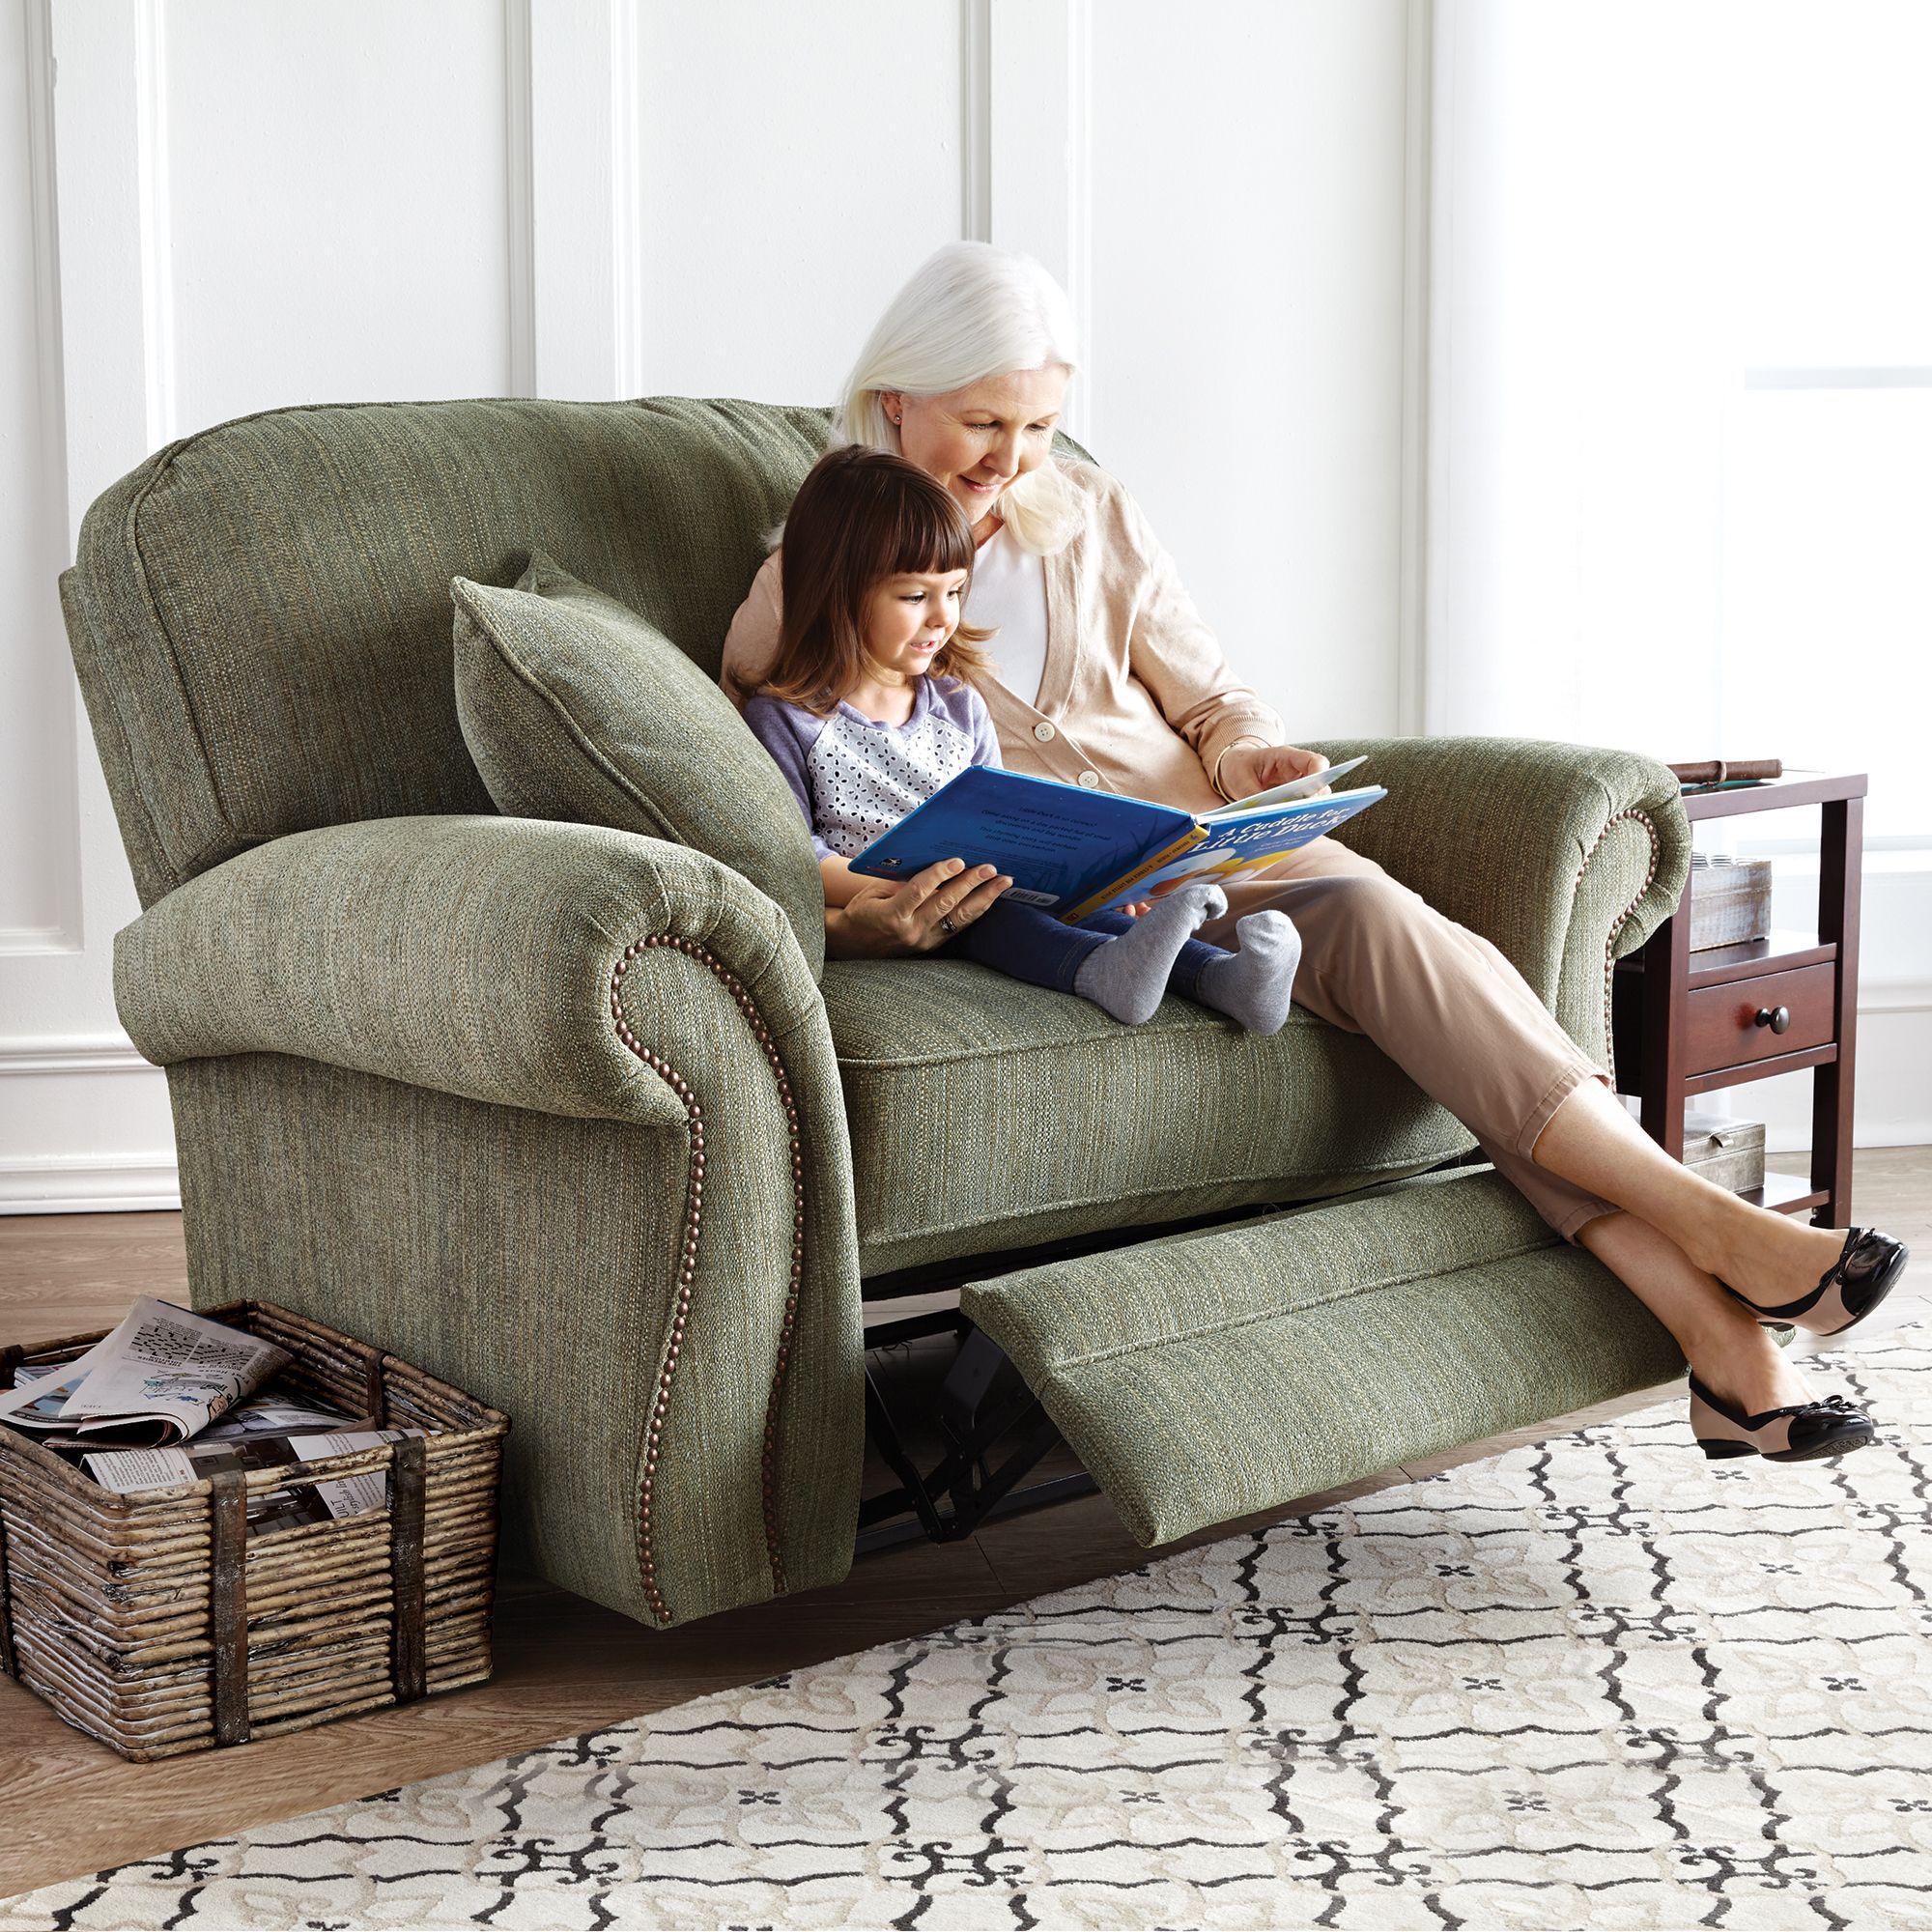 Broyhill Bradbury Snuggler Recliner Chair This Is A Beautiful